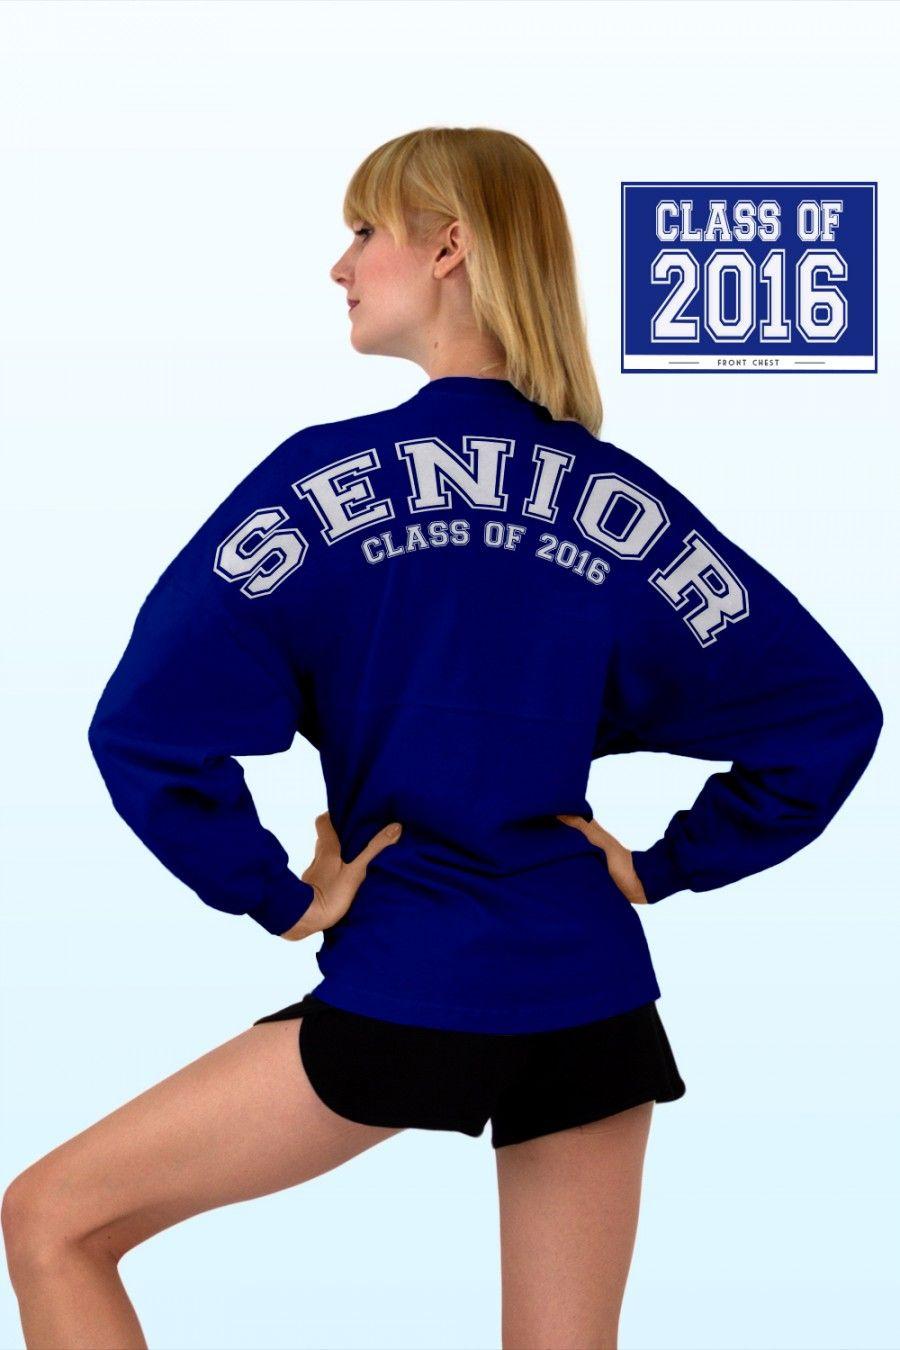 class of 2016 jersey